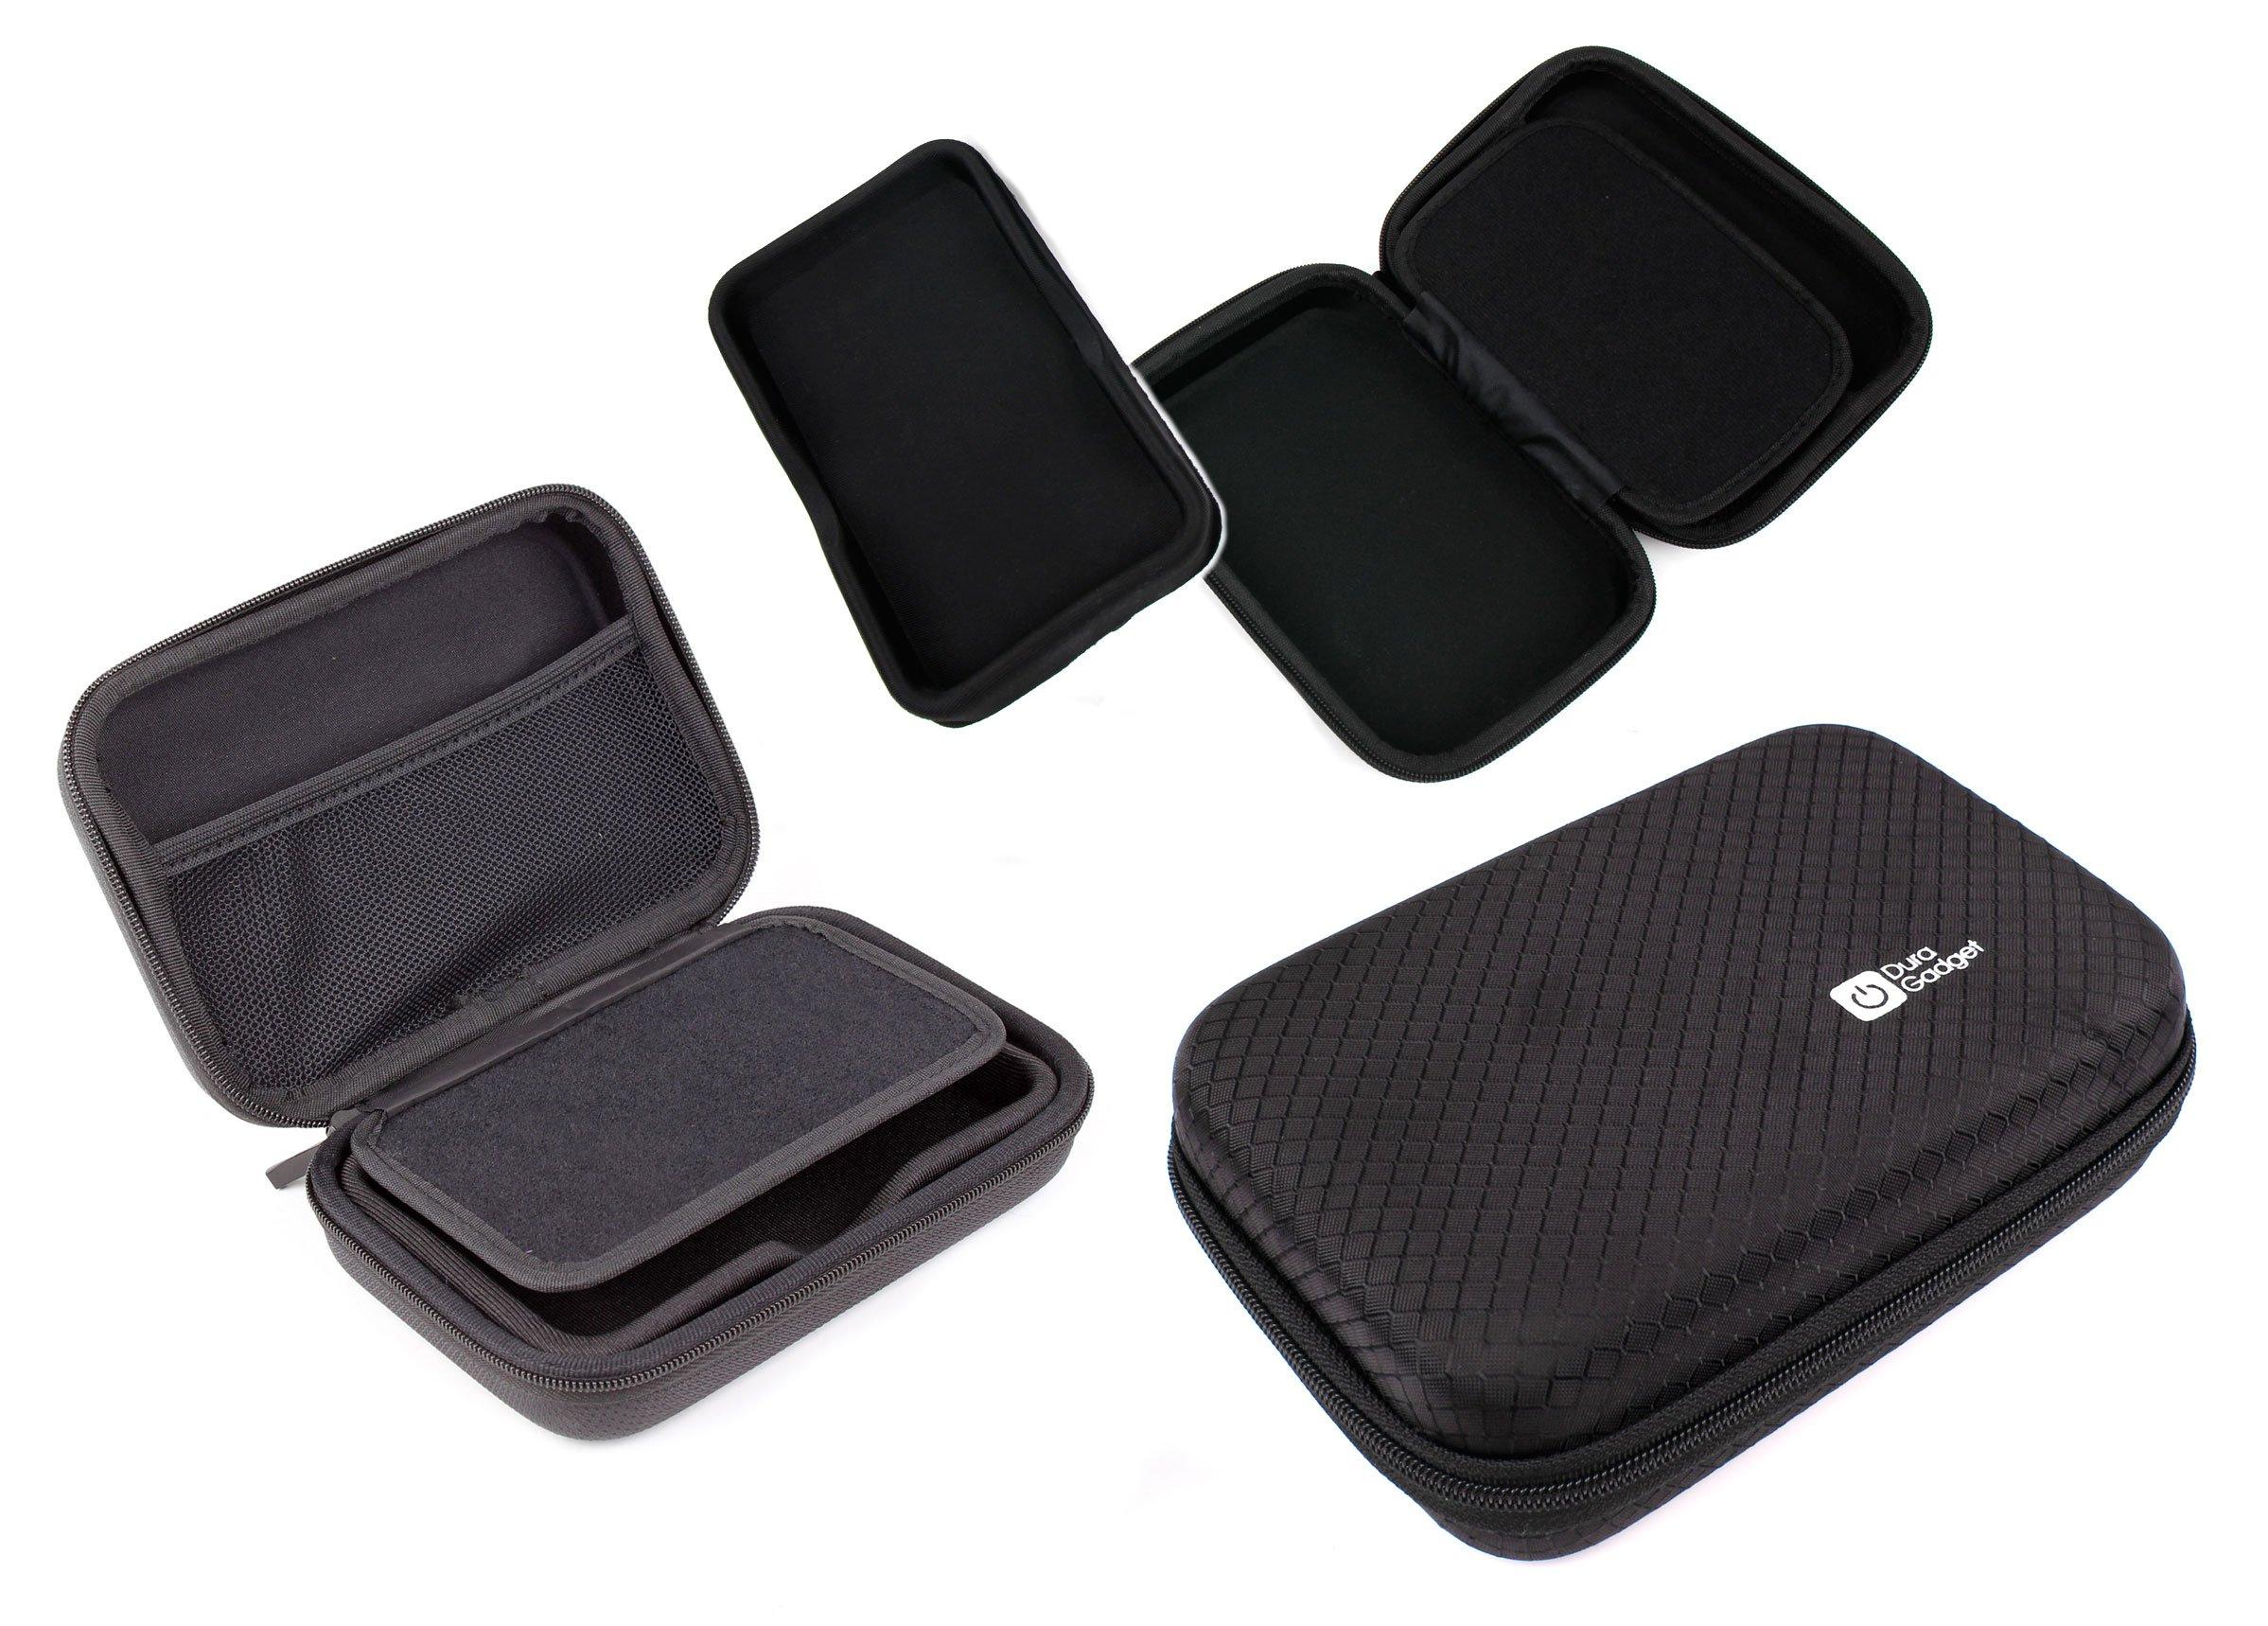 DURAGADGET Black Hard 5'' Satnav Case for devices including Garmin Nuvi 2595LMT